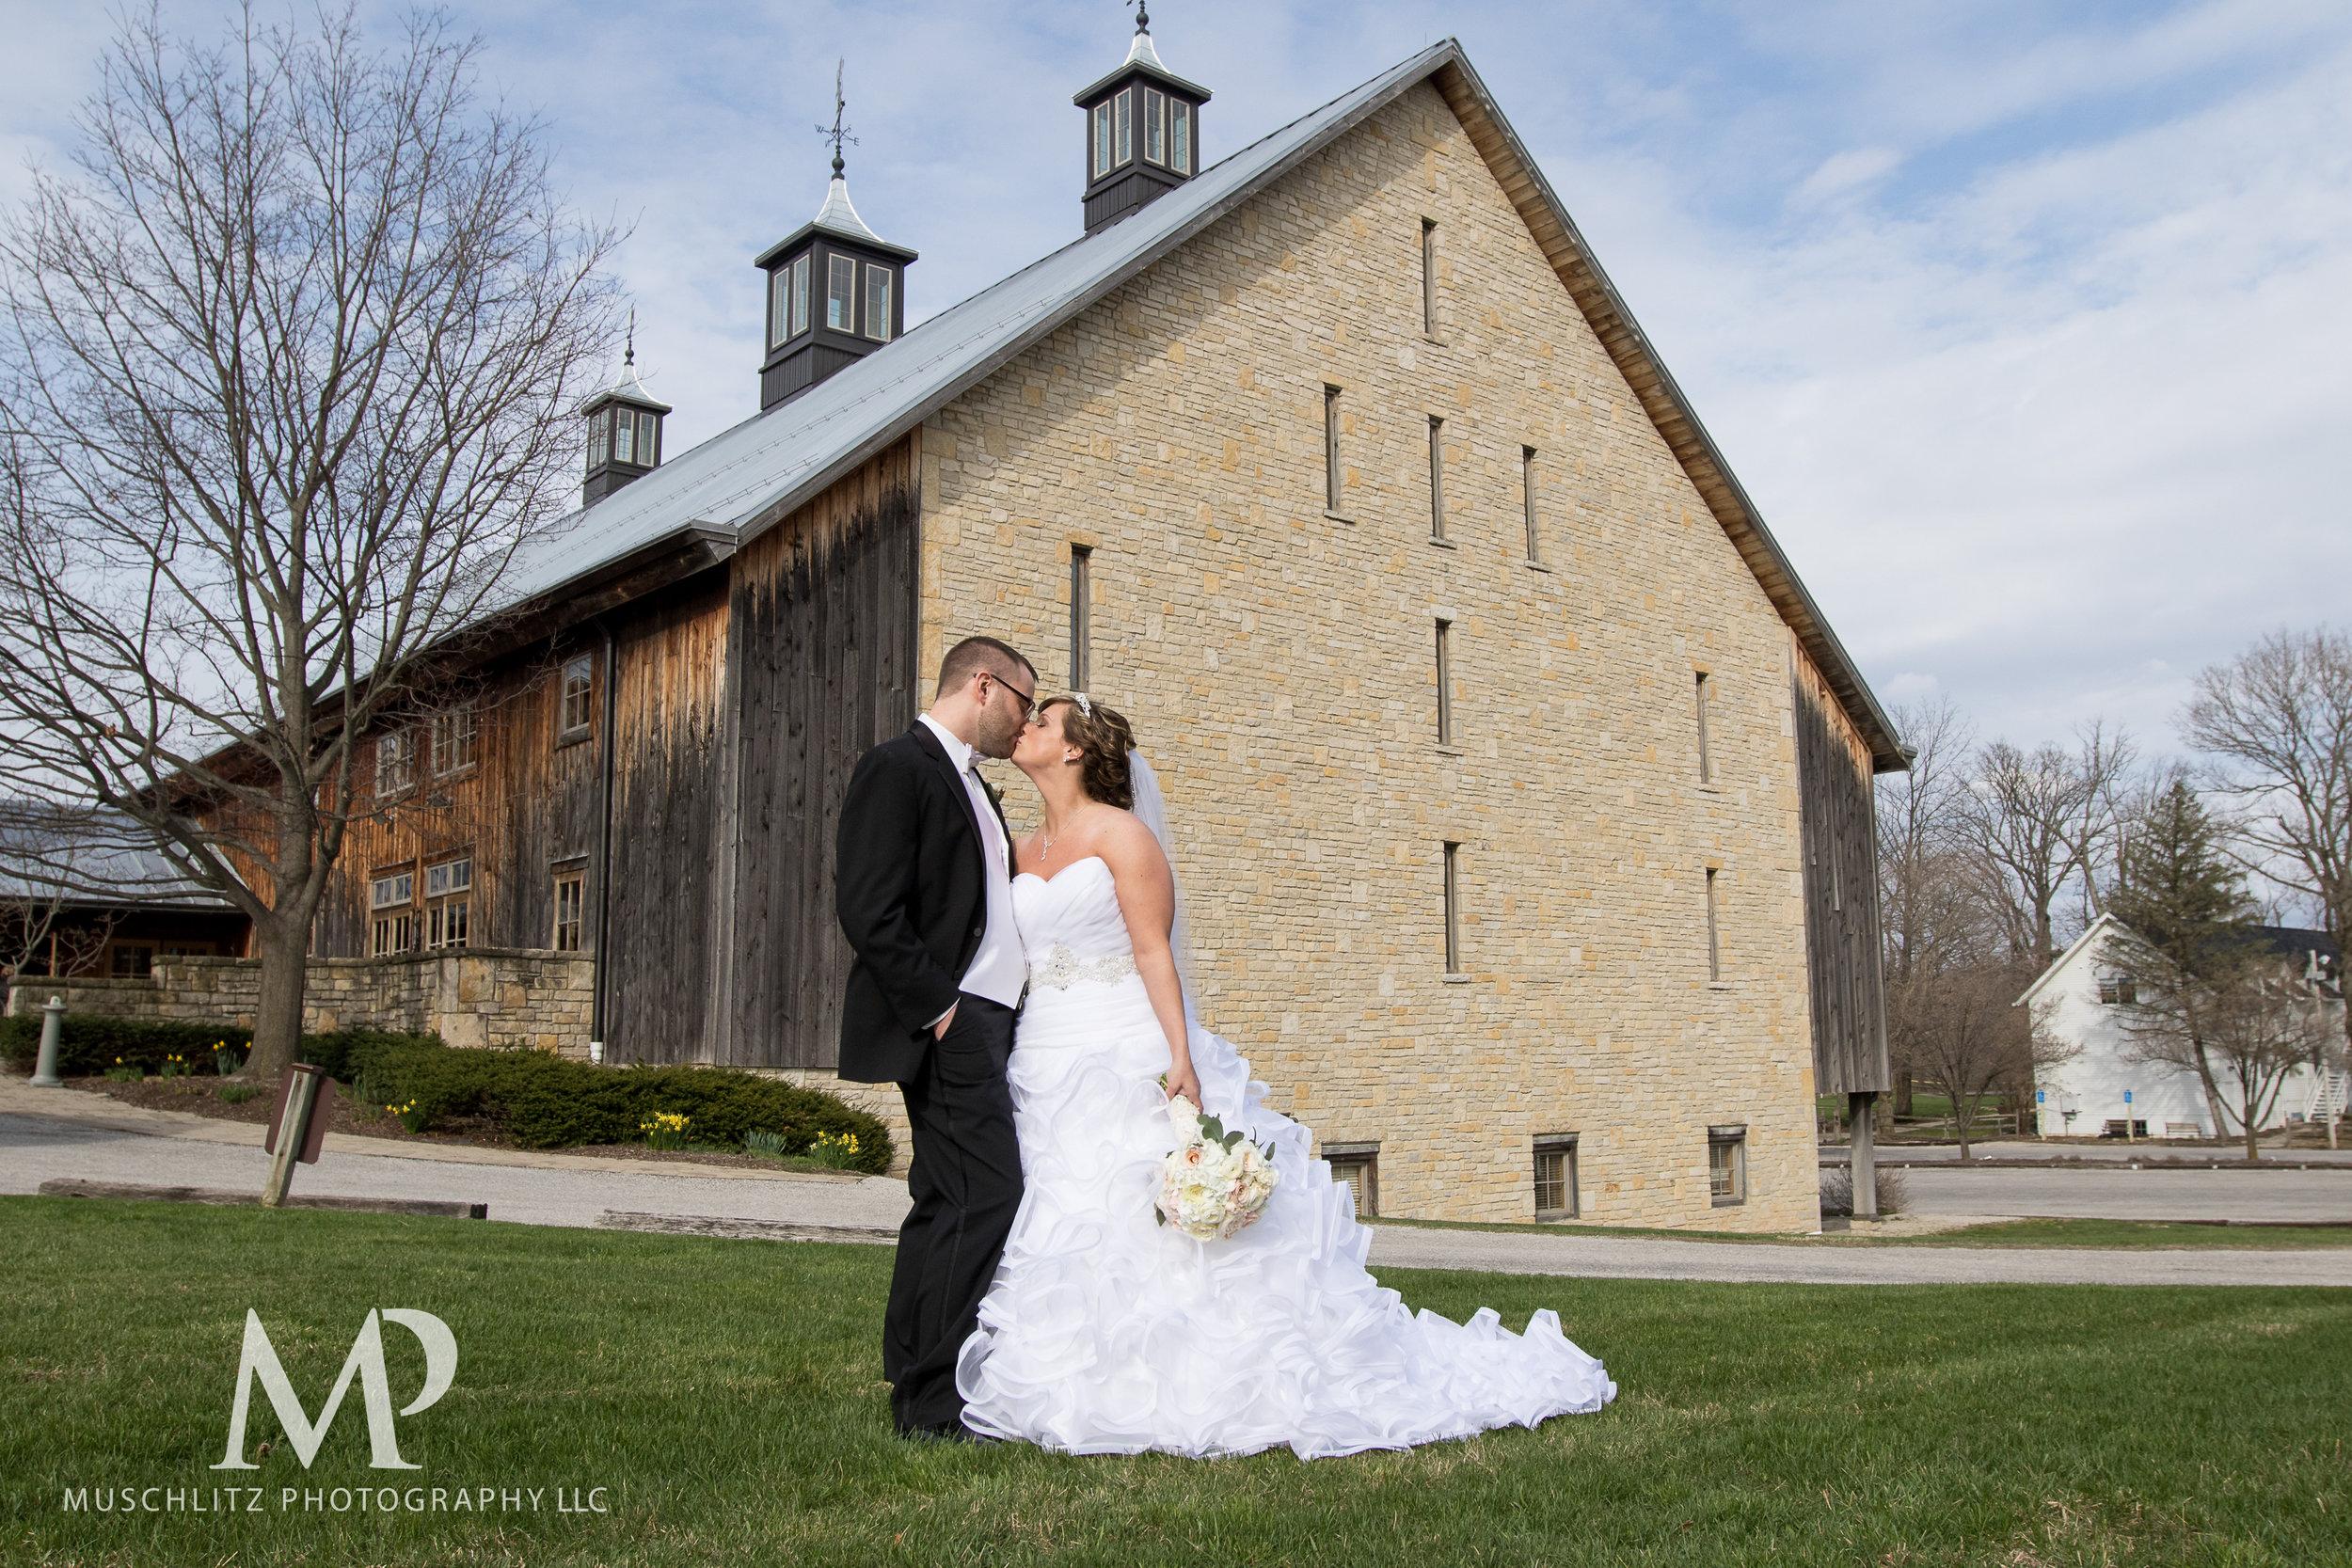 liberty-barn-presbyterian-church-wedding-delaware-columbus-ohio-muschlitz-photography-054.JPG